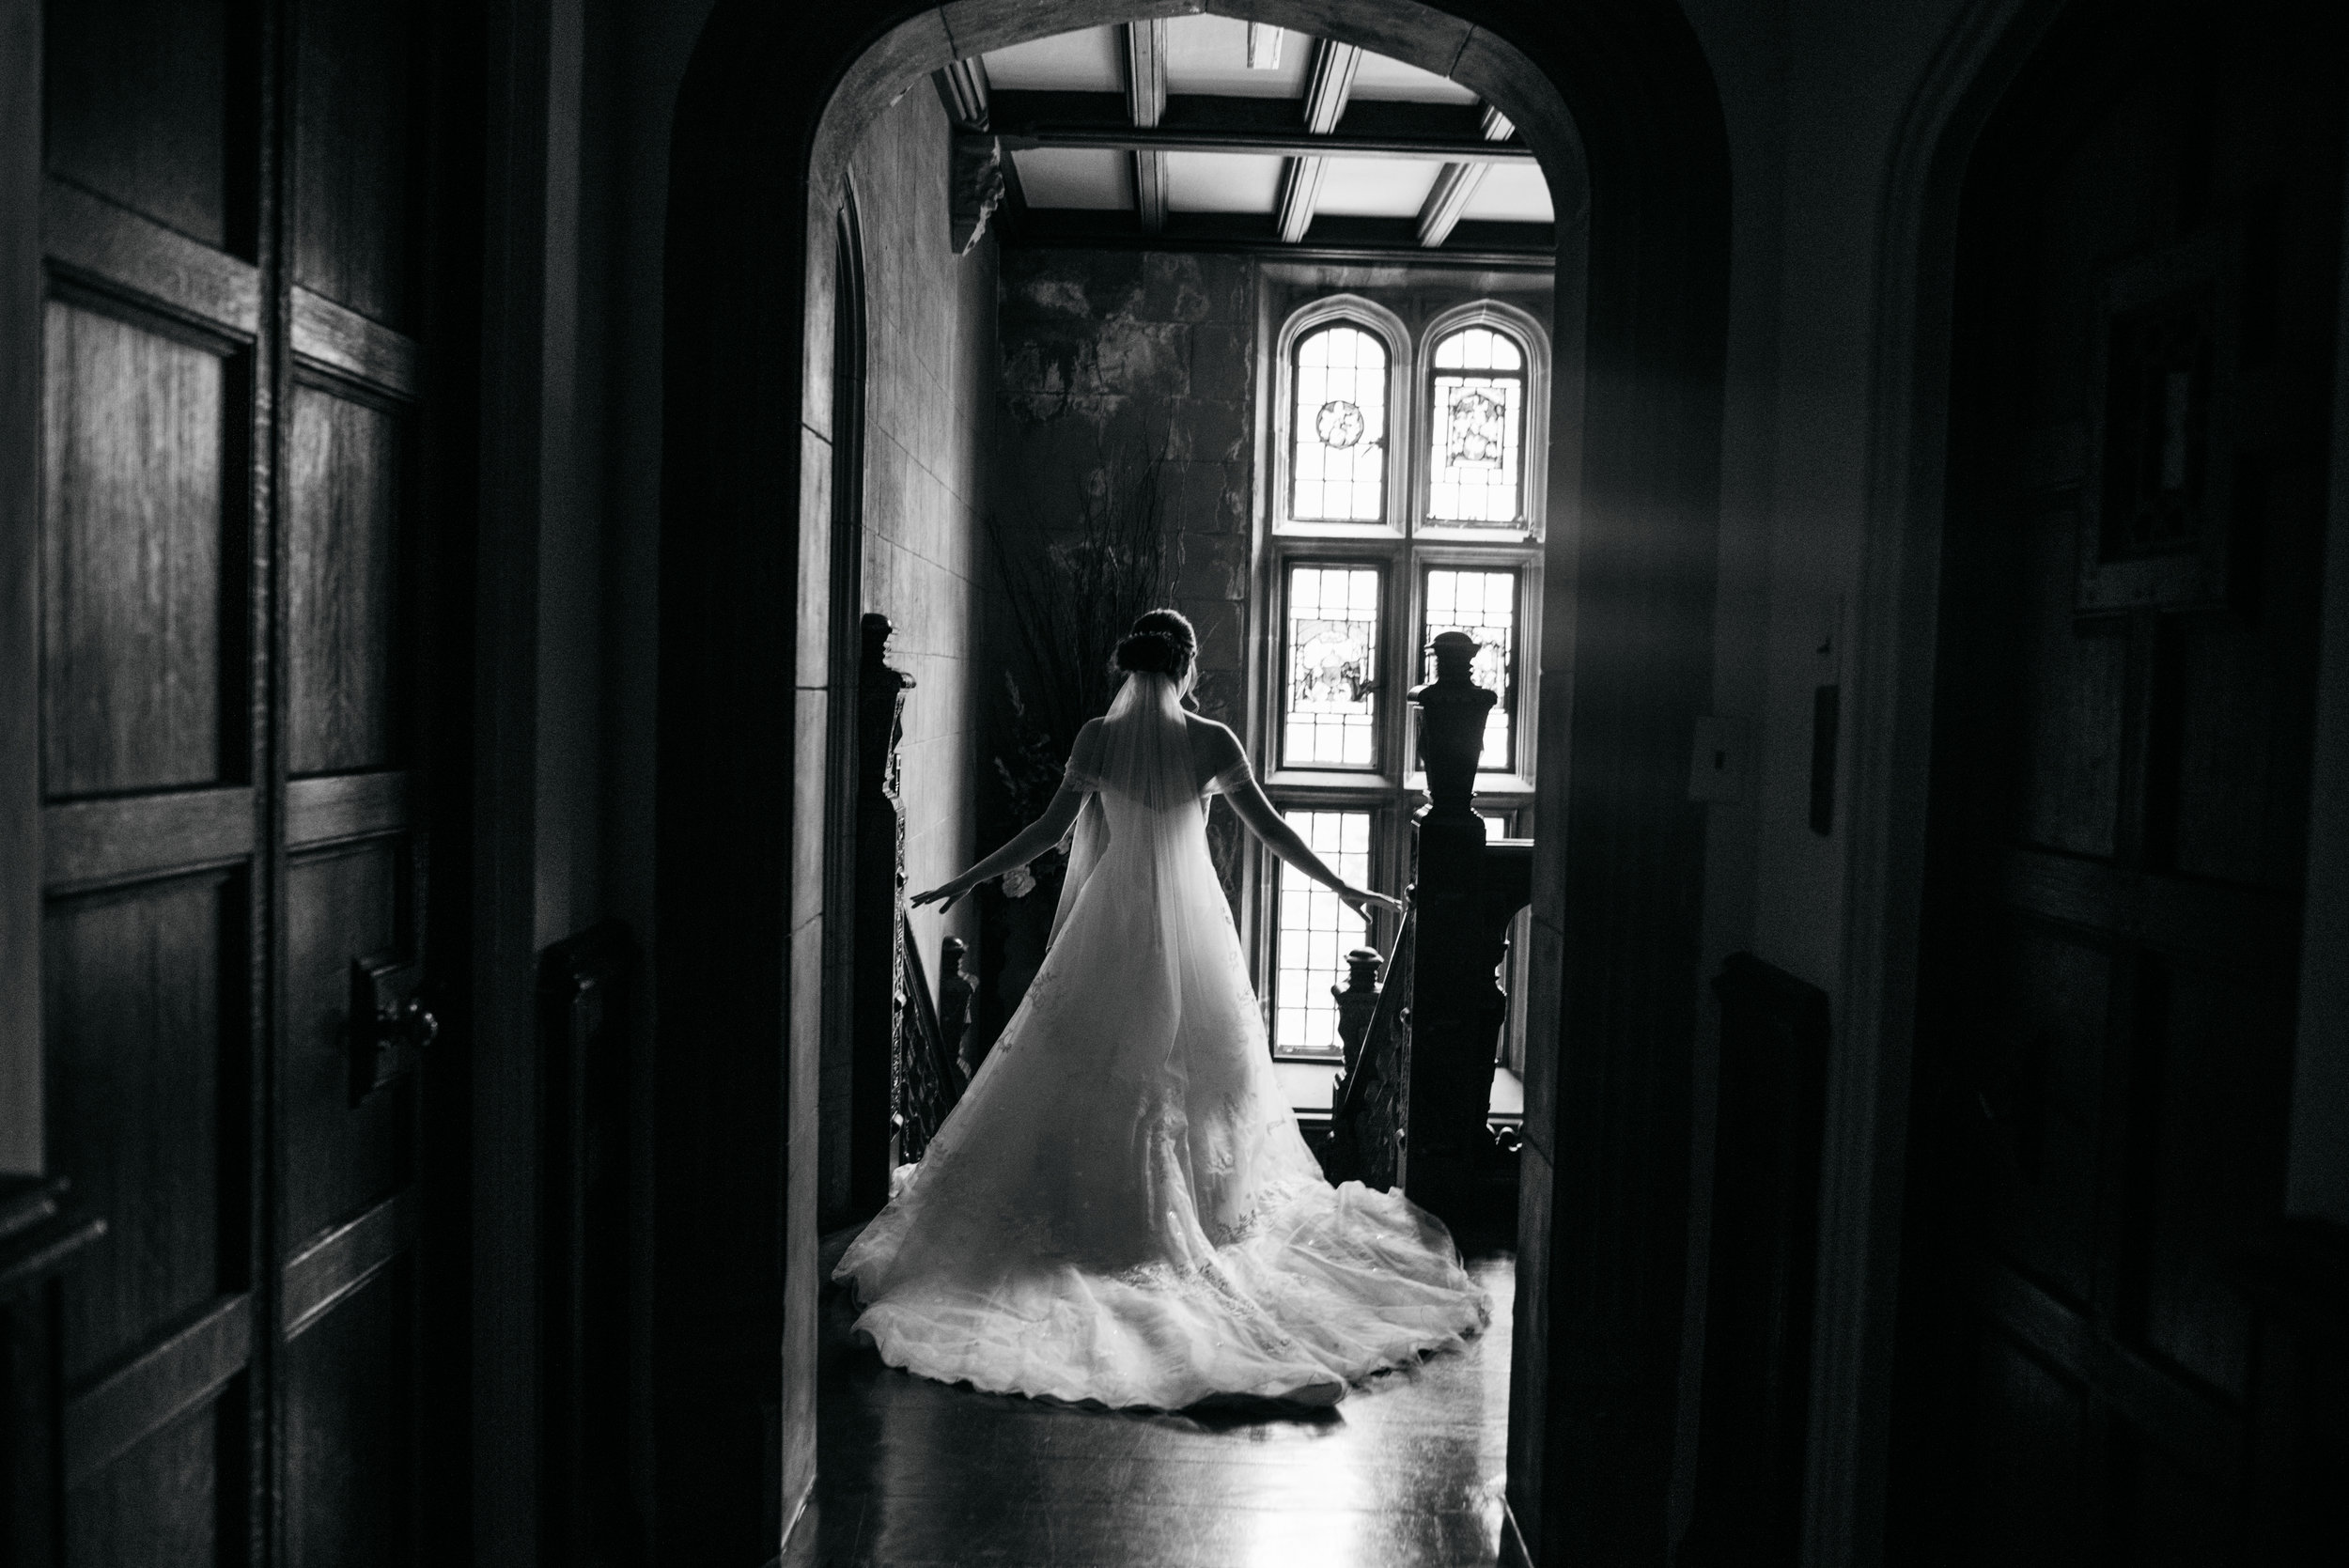 WeddingPhotos | NJPhotographer | Highlights-3-18.jpg